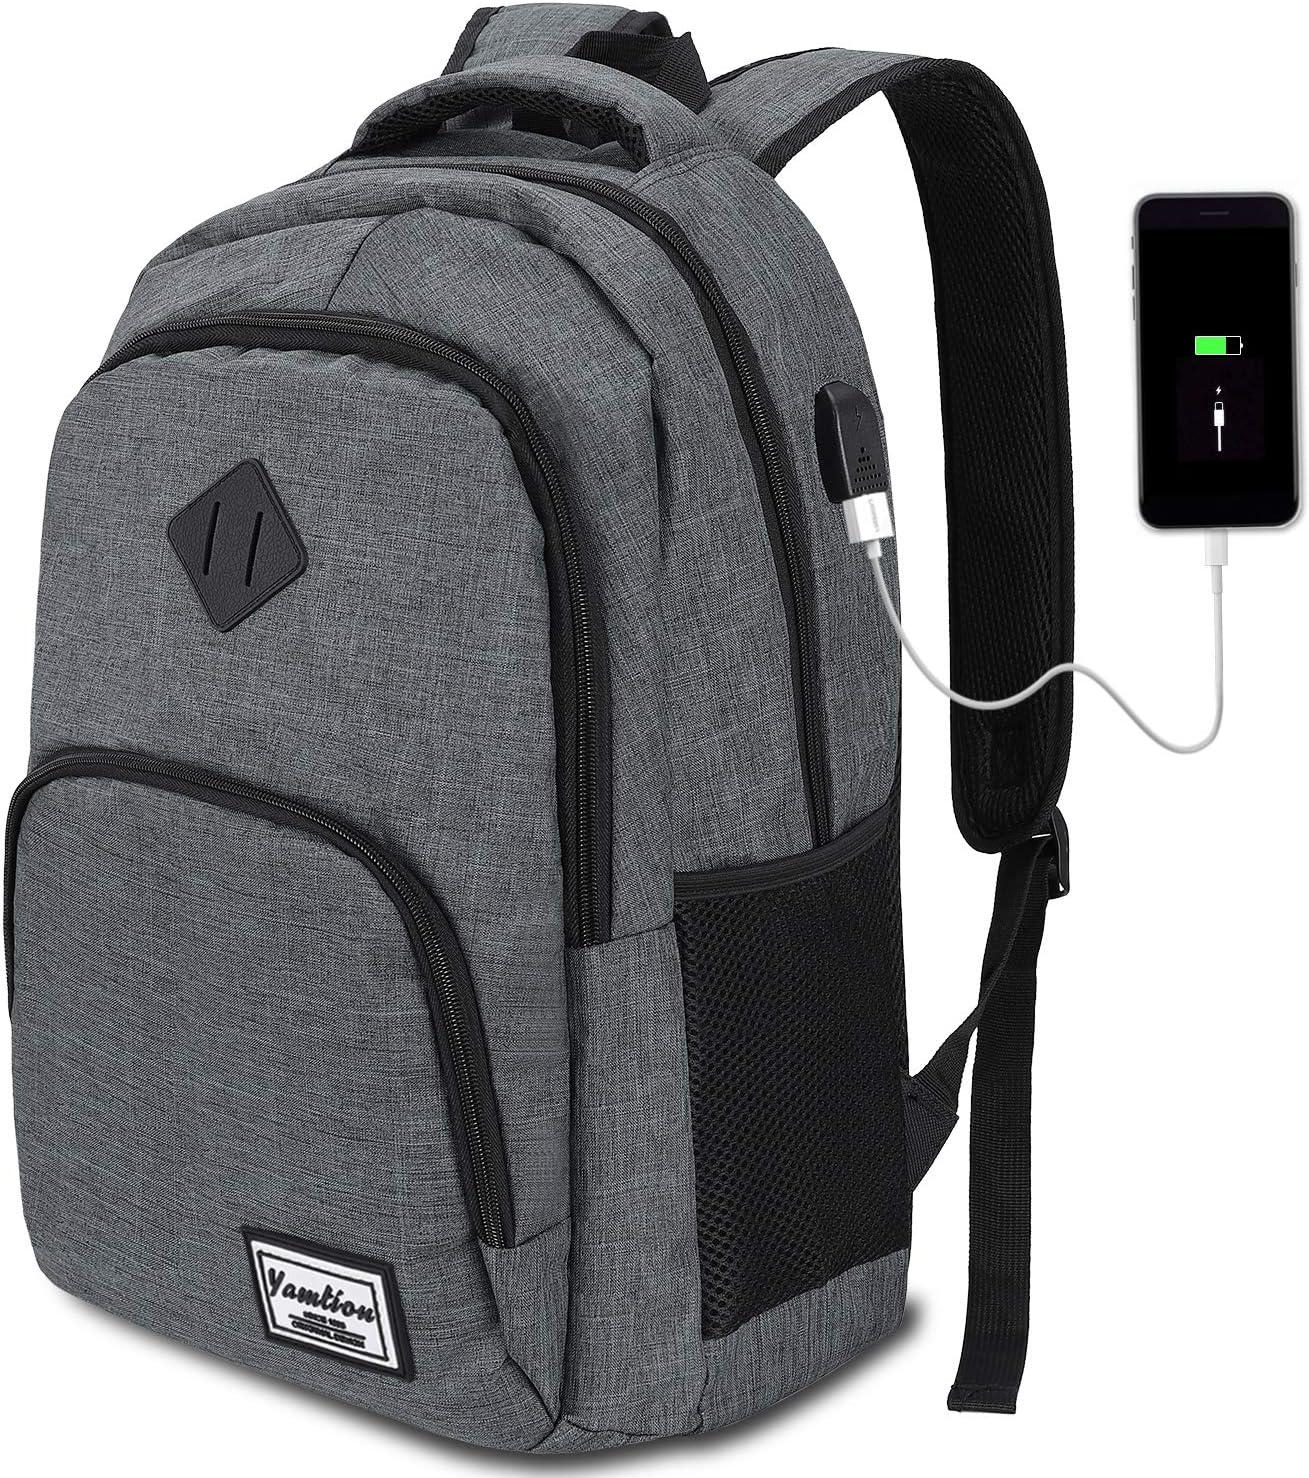 YAMTION Mochila Hombre para Portátil Mochilas Escolares Juveniles con Puerto USB Resistente al Agua 35L (15,6 Pulgadas, B6-Gris Oscuro)